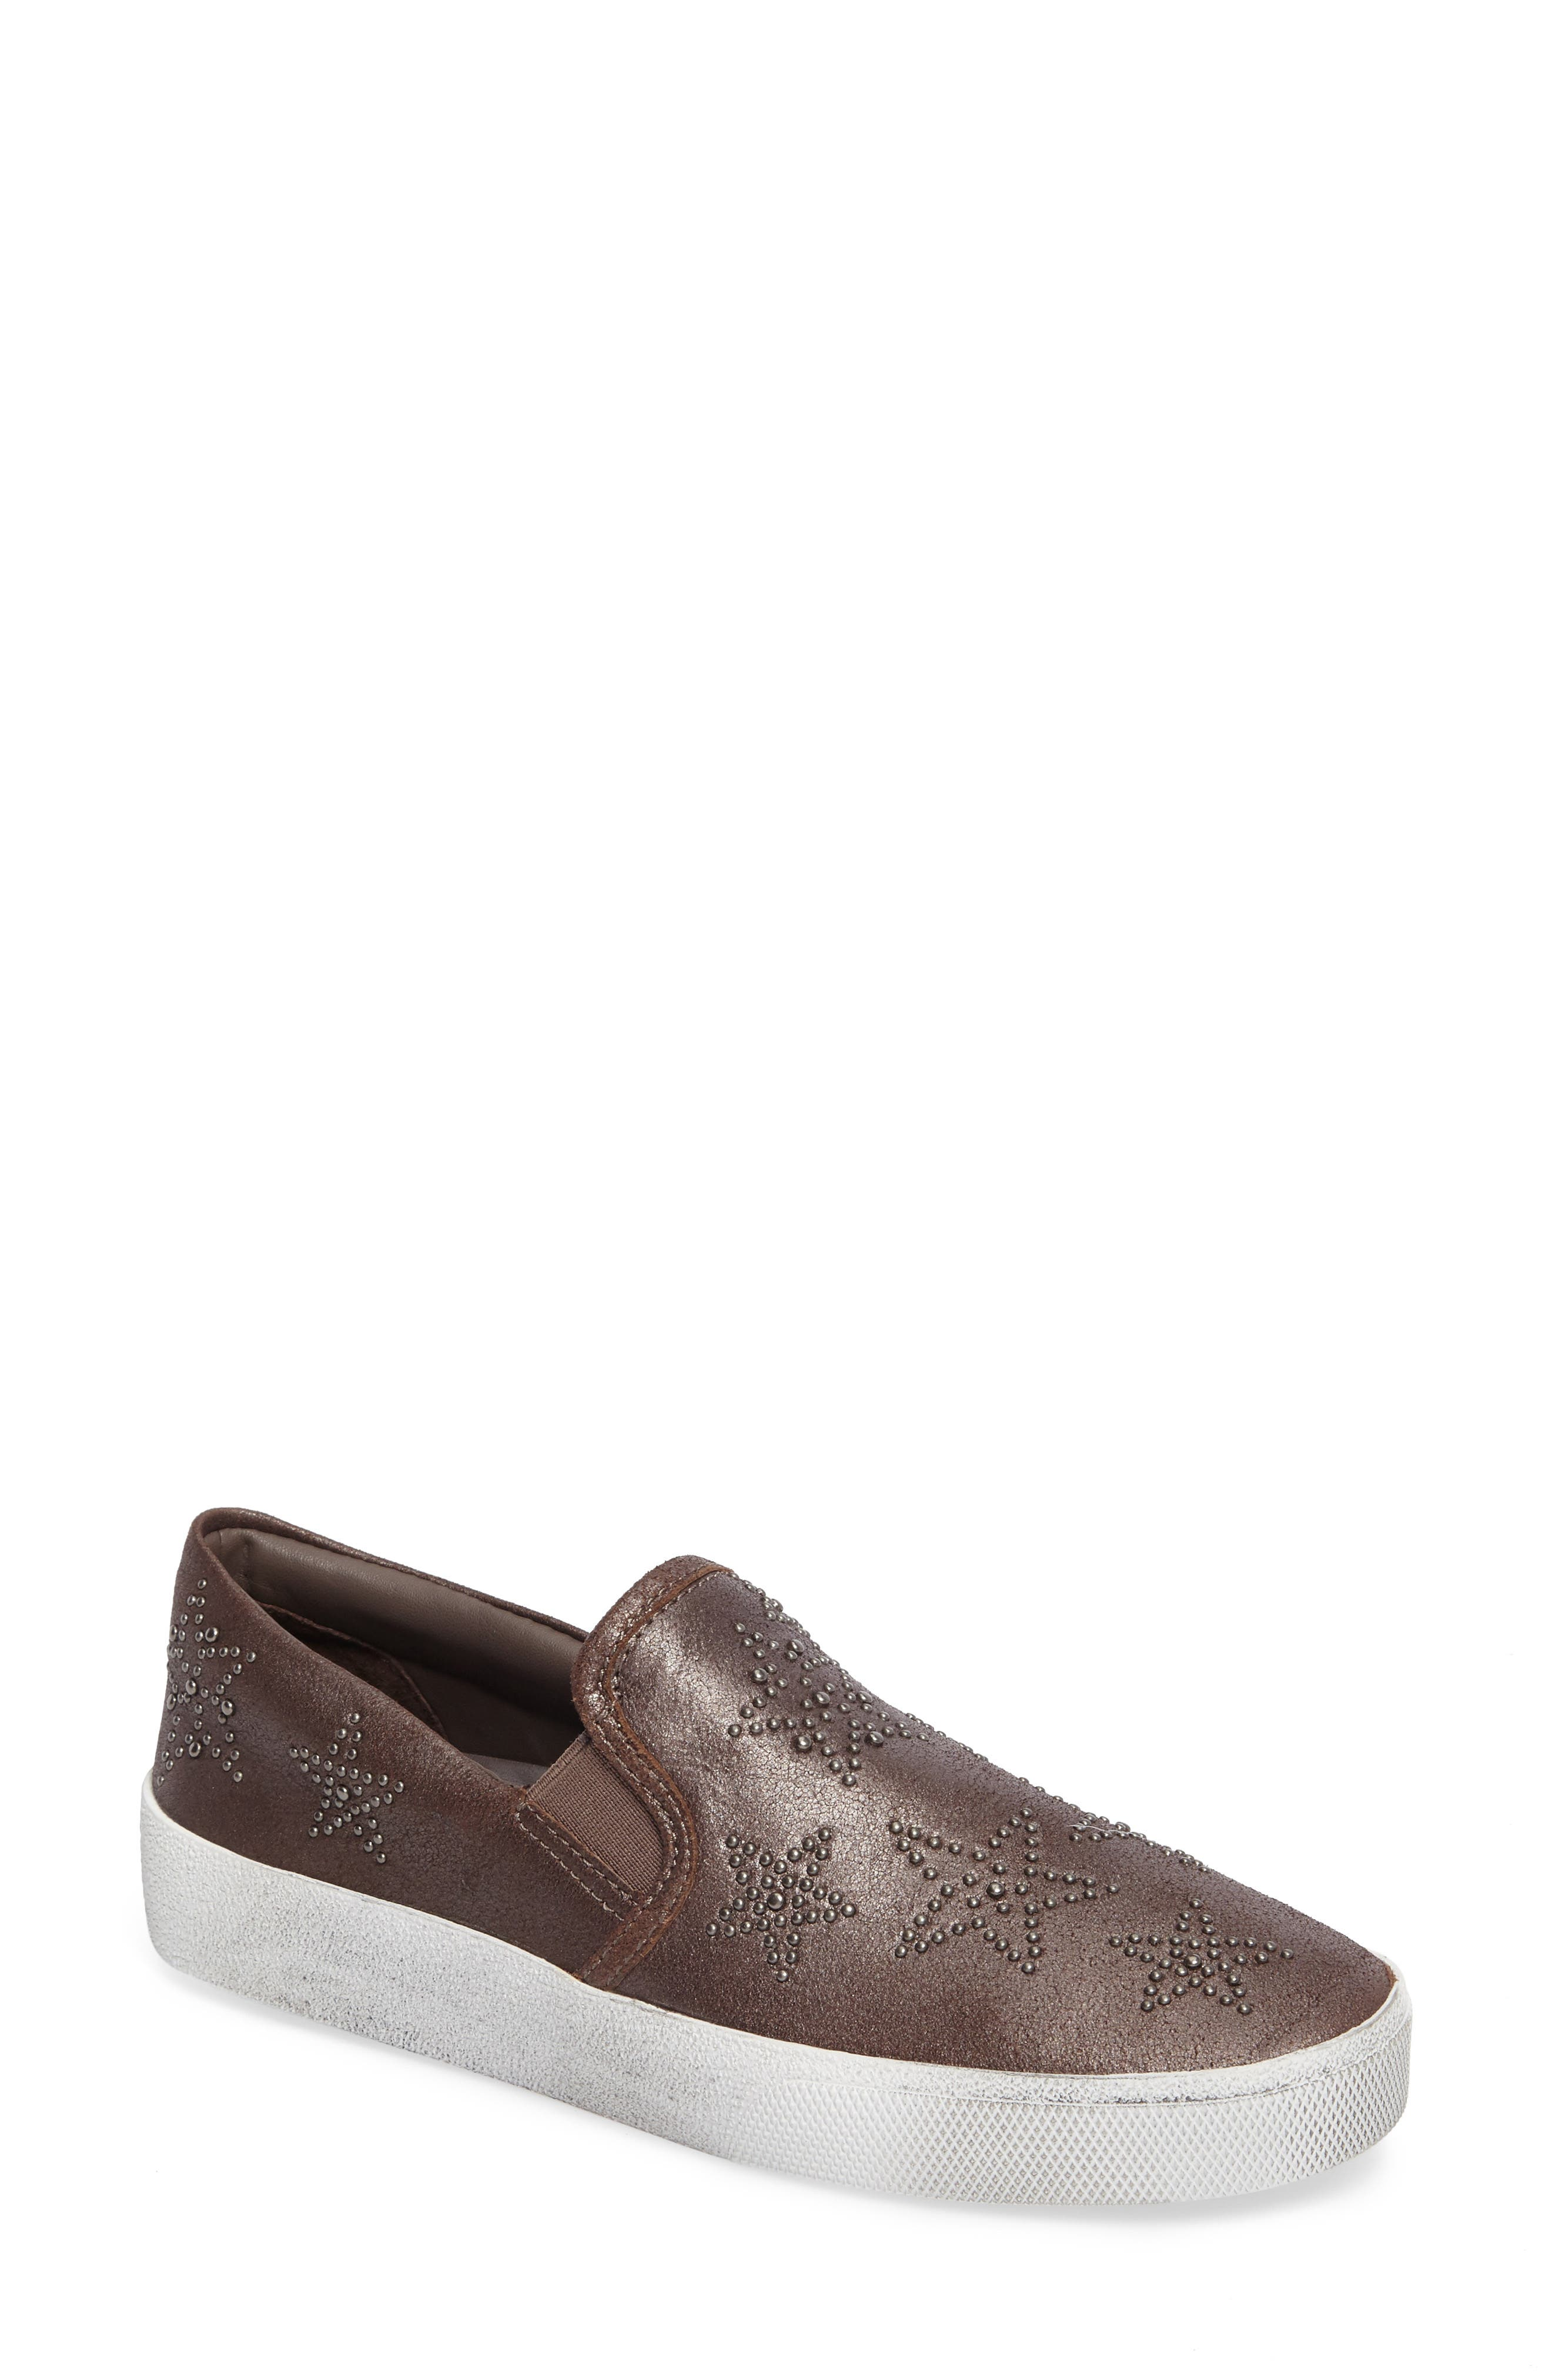 Star Slip-On Sneaker,                         Main,                         color, Bronze